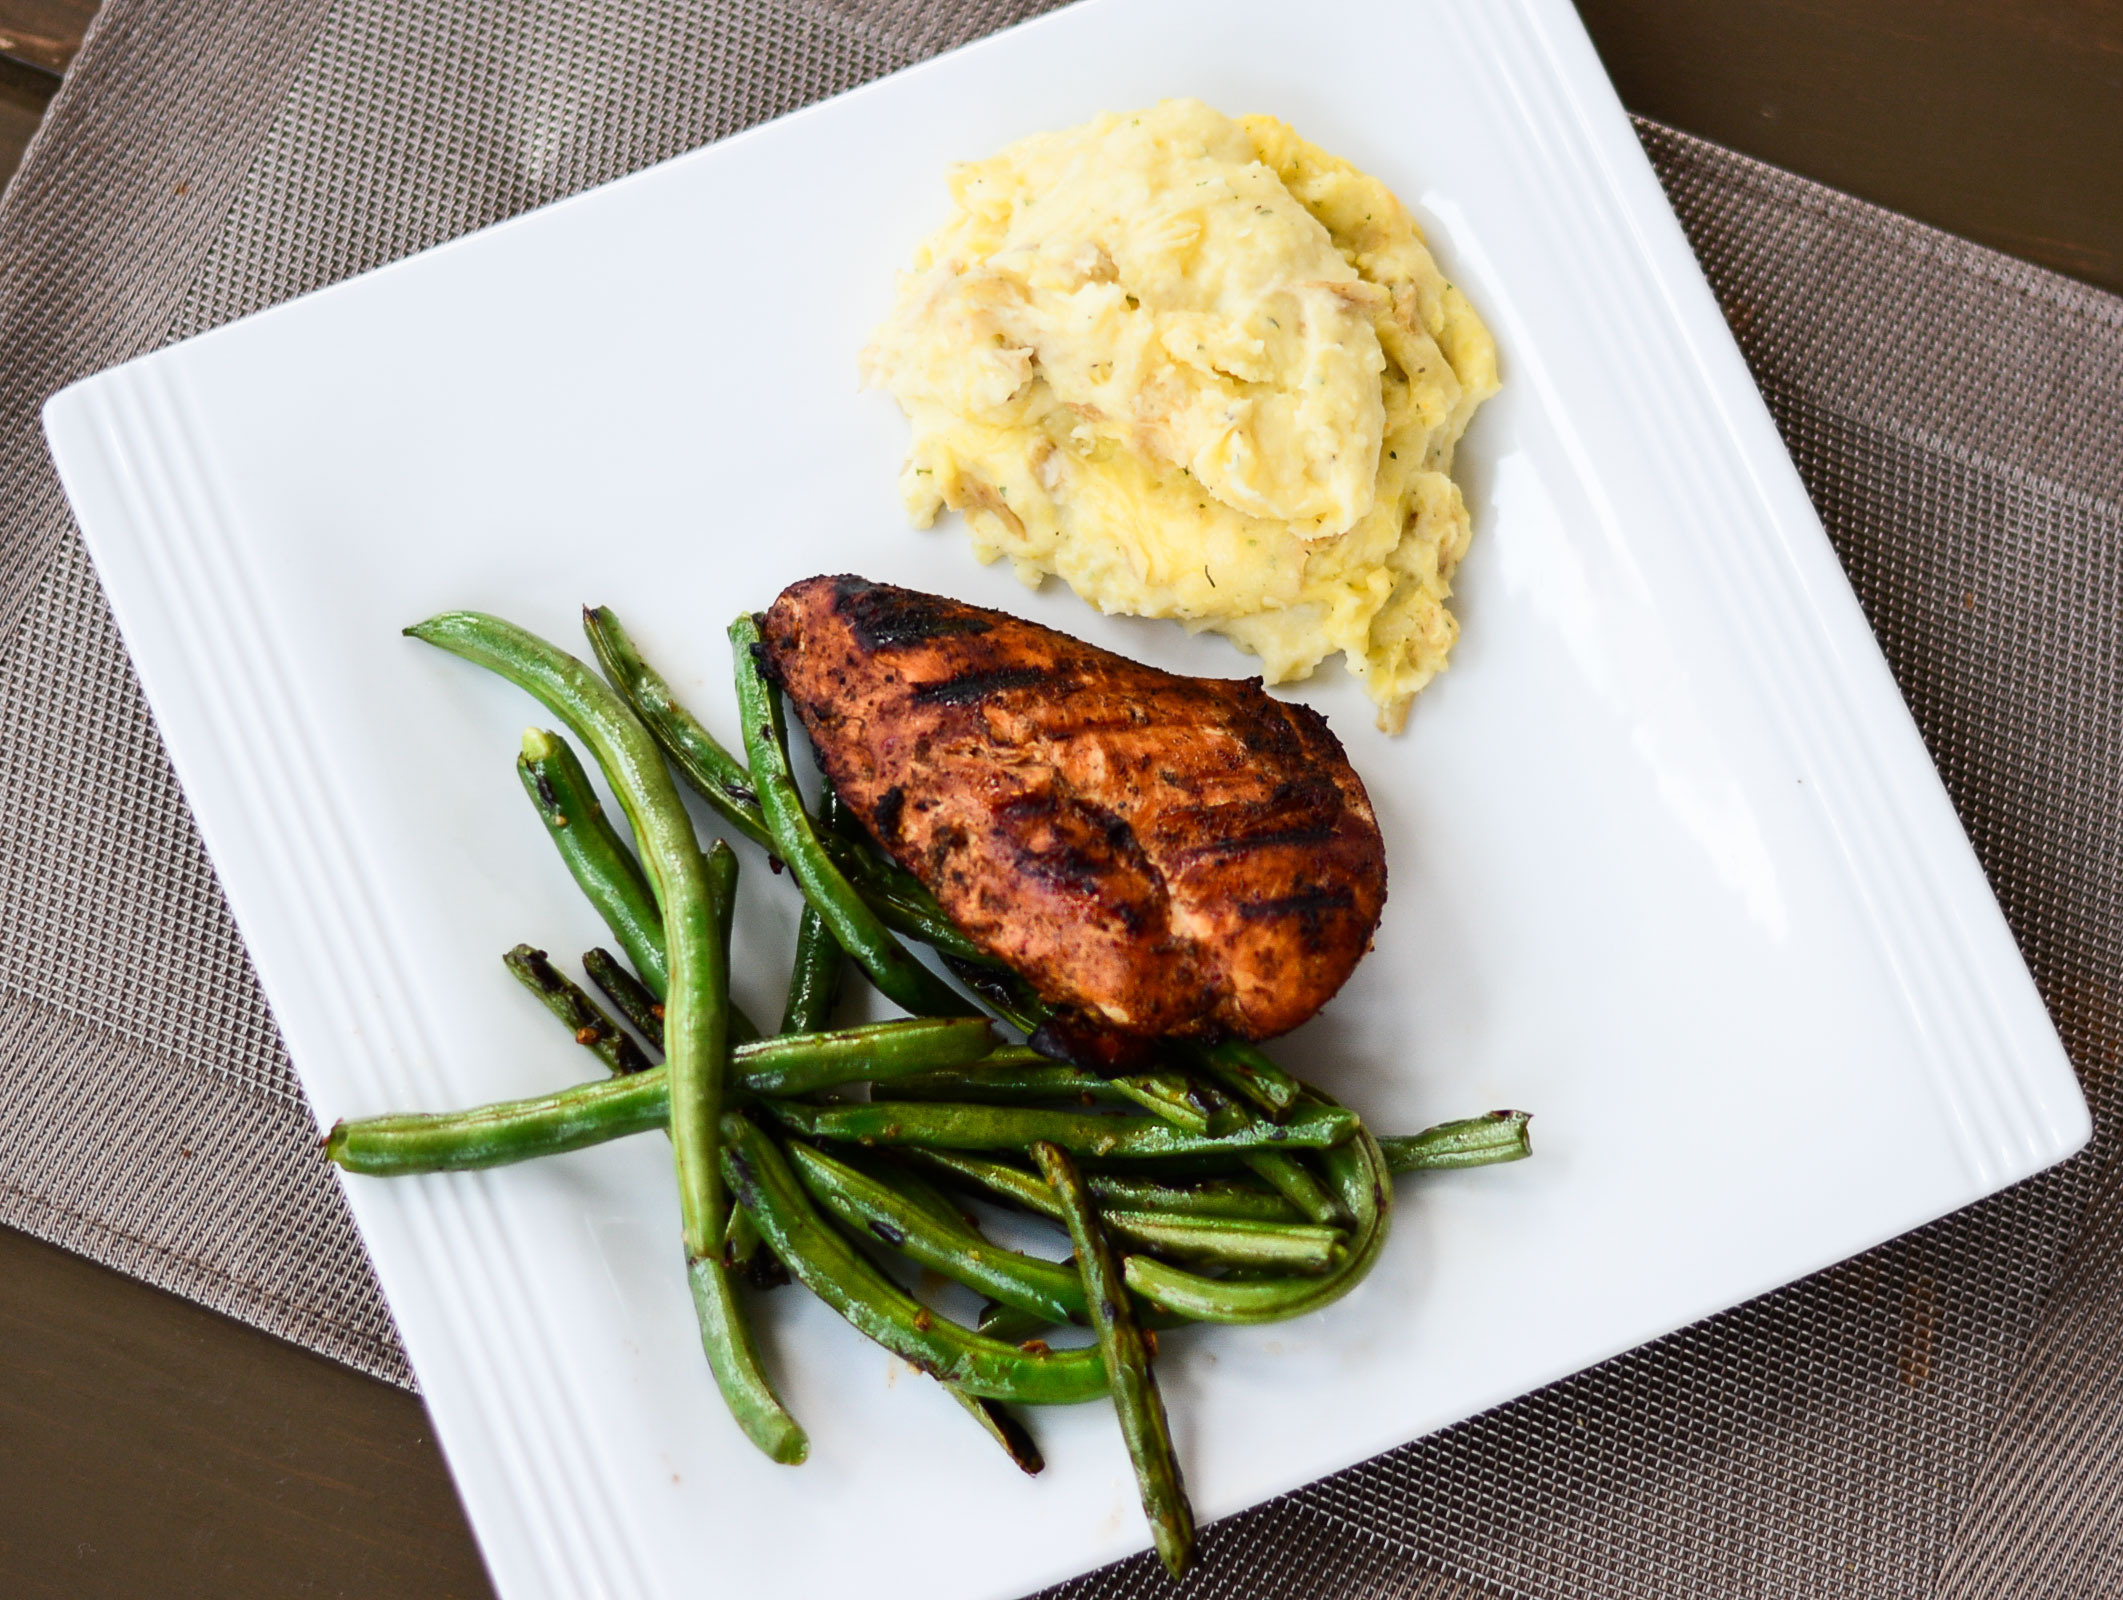 balsamic-chicken-+-charred-green-beans